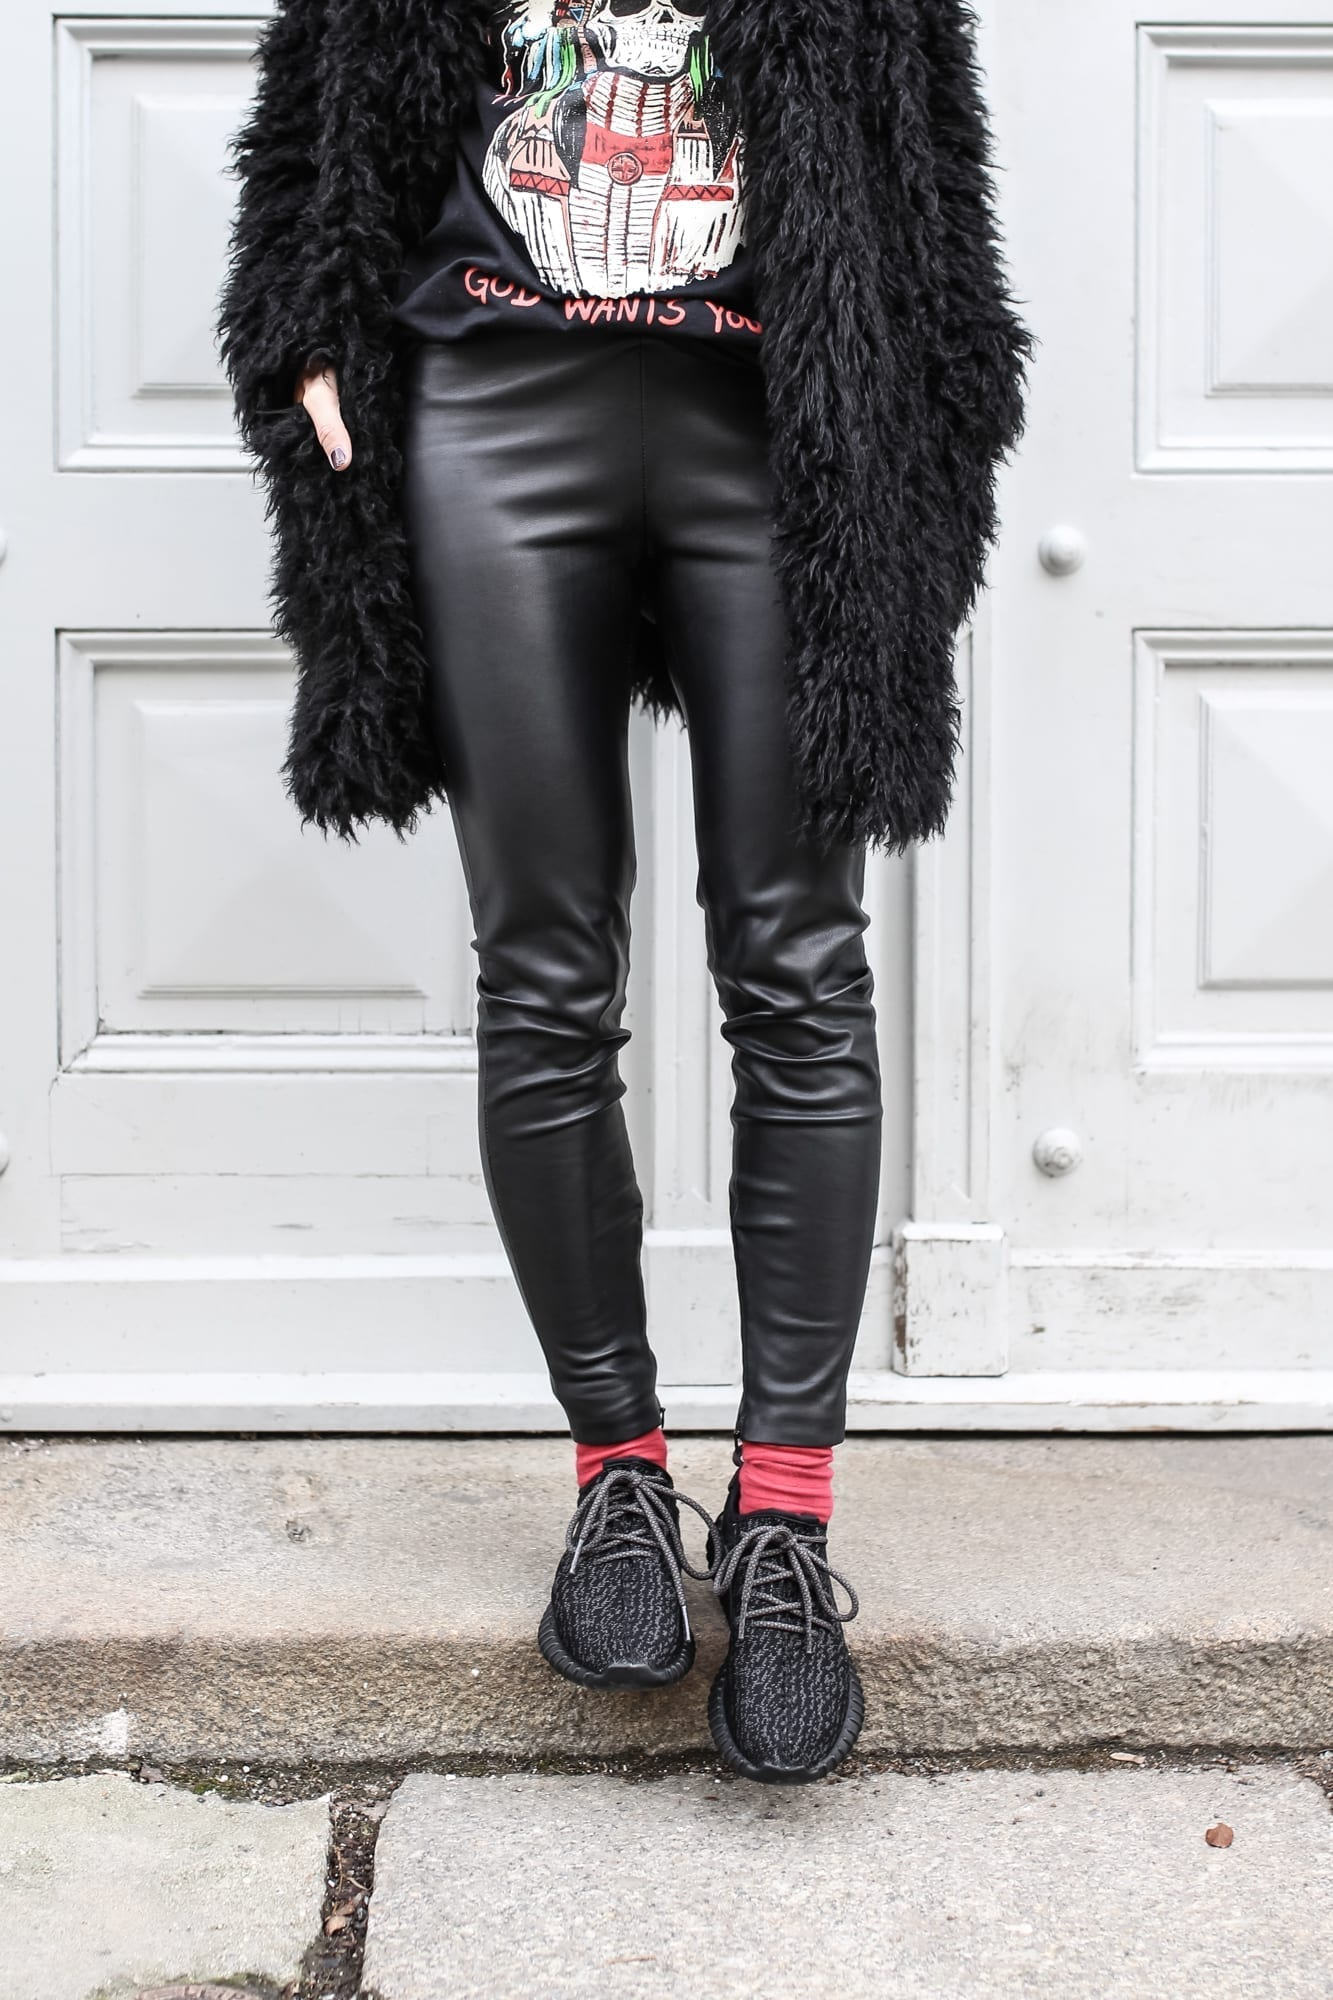 CK_1603_constantlyk_yeezy_fashion-9108